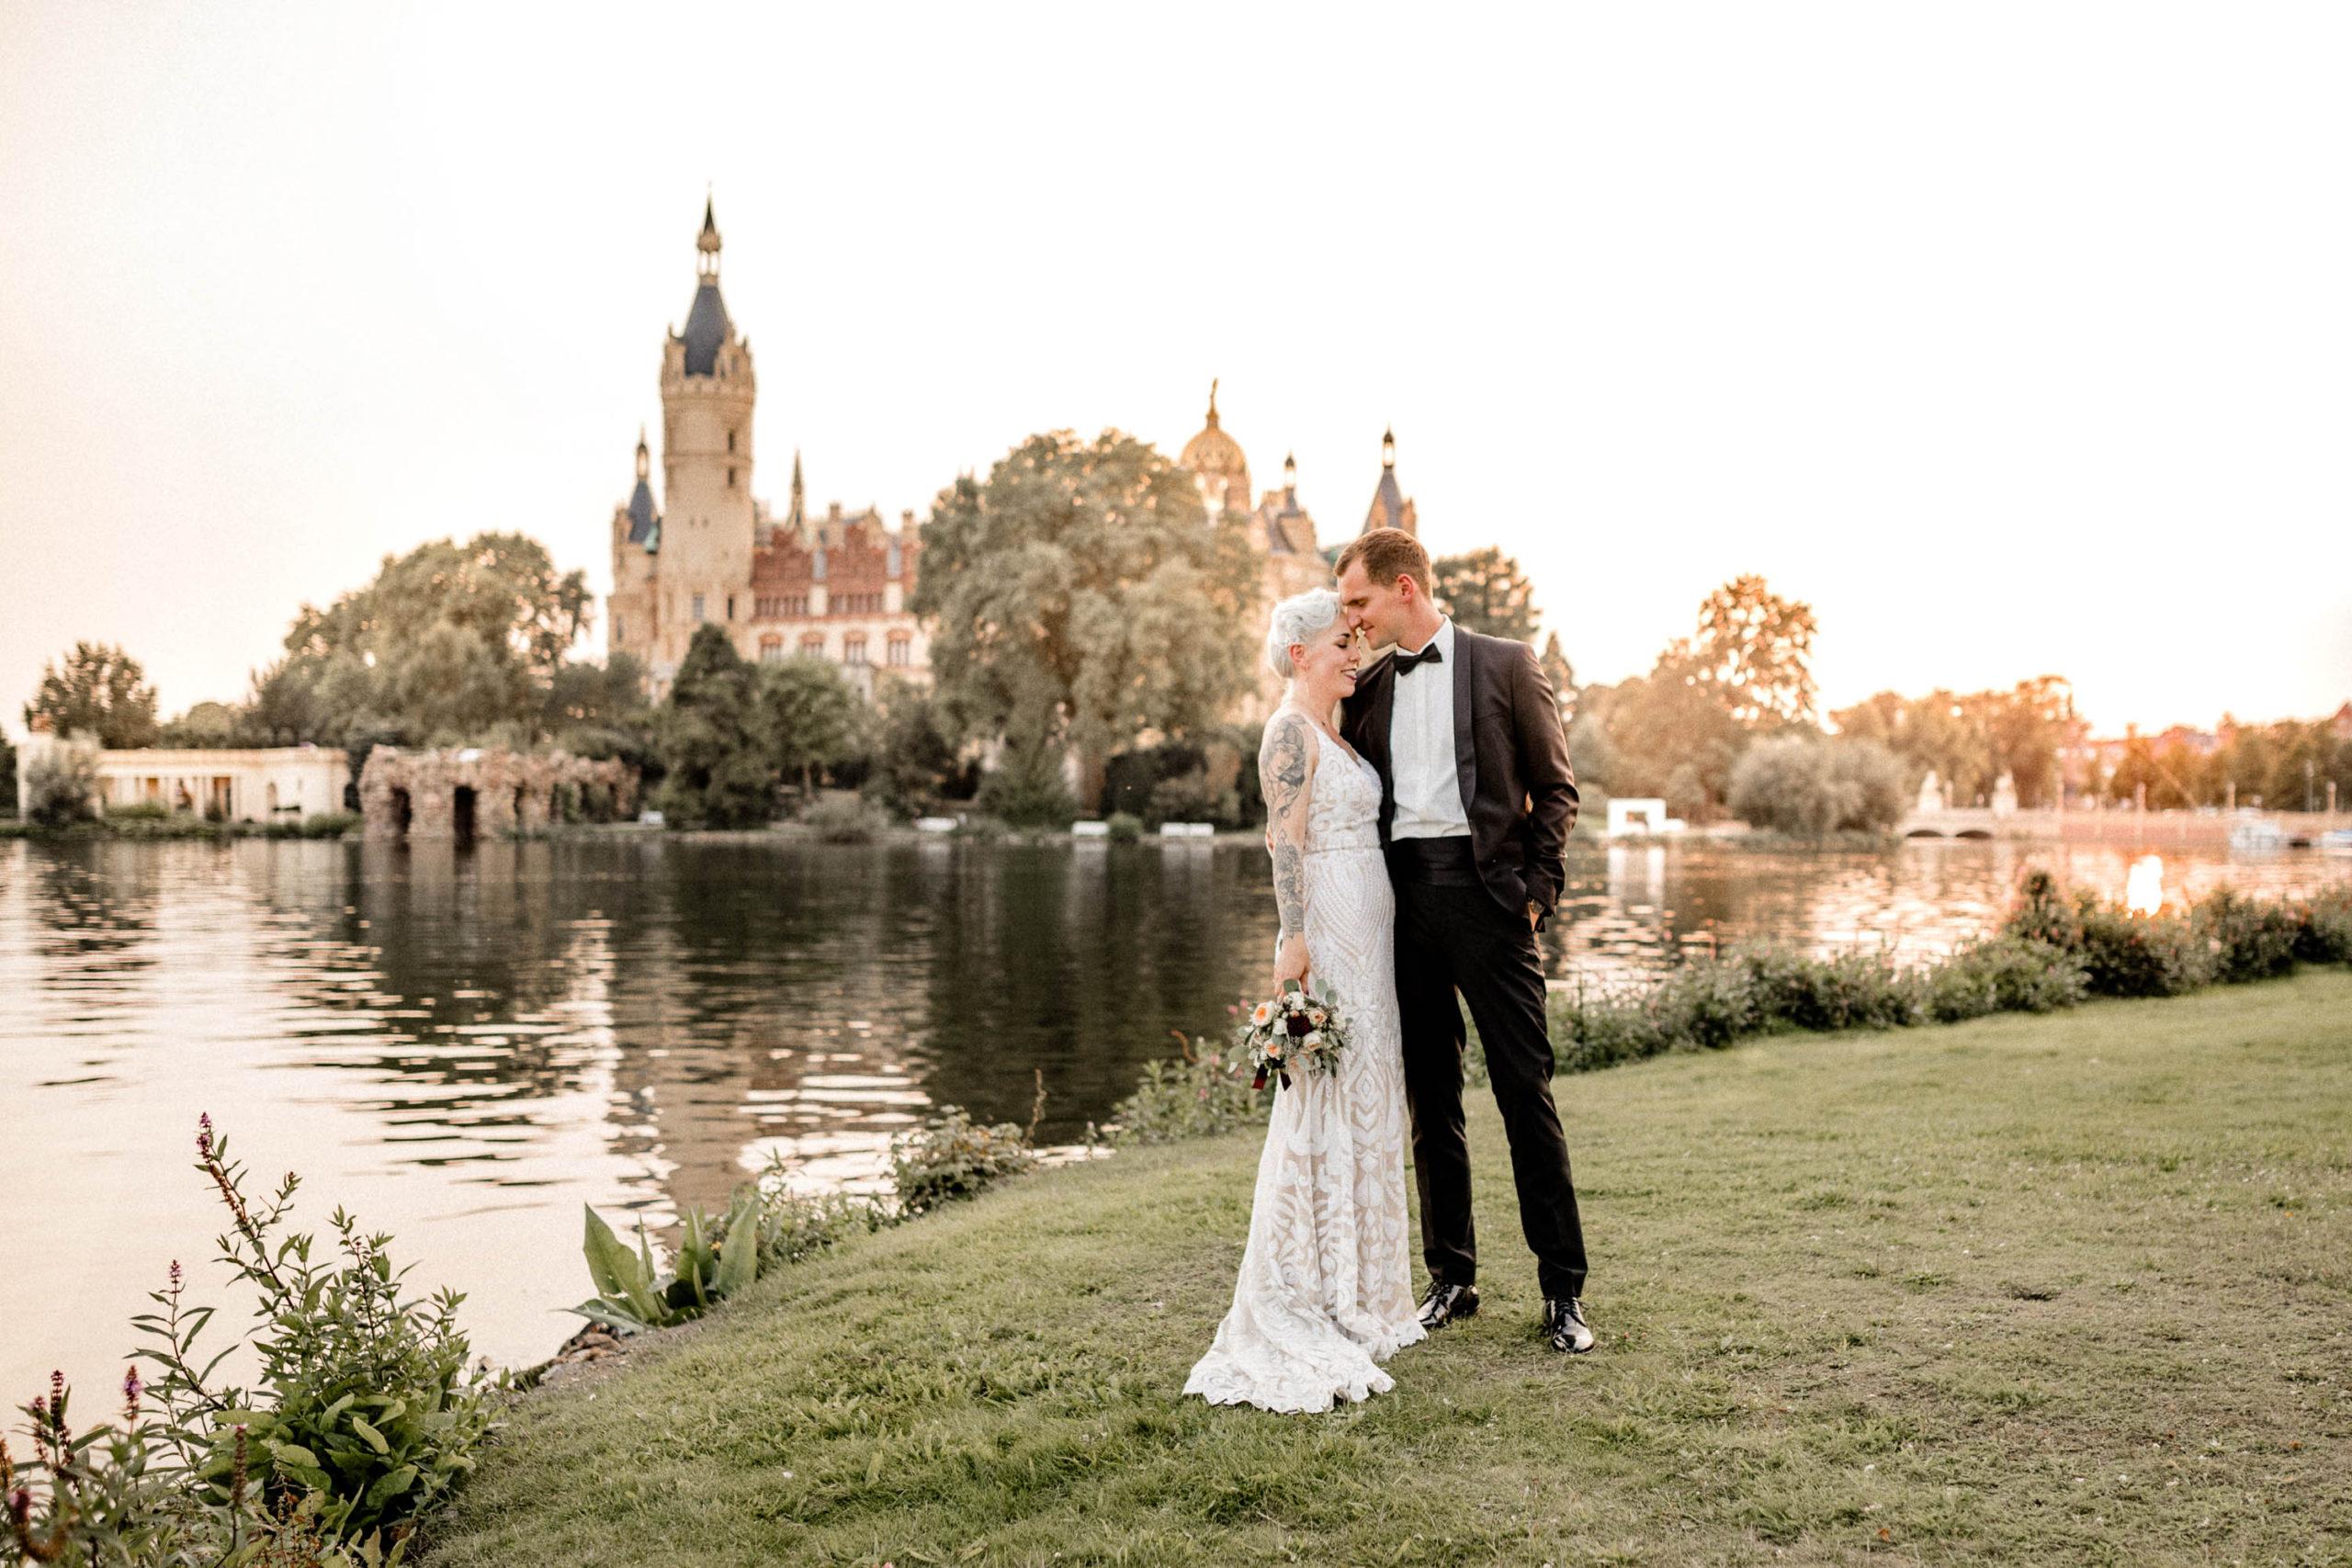 Virginia-Pech-Fotografie-Hochzeitsfotograf-Hochzeitsfotografie-Hochzeitsfotos-Schwerin-Schloss-Seglerheim-Schelfkirche-109-